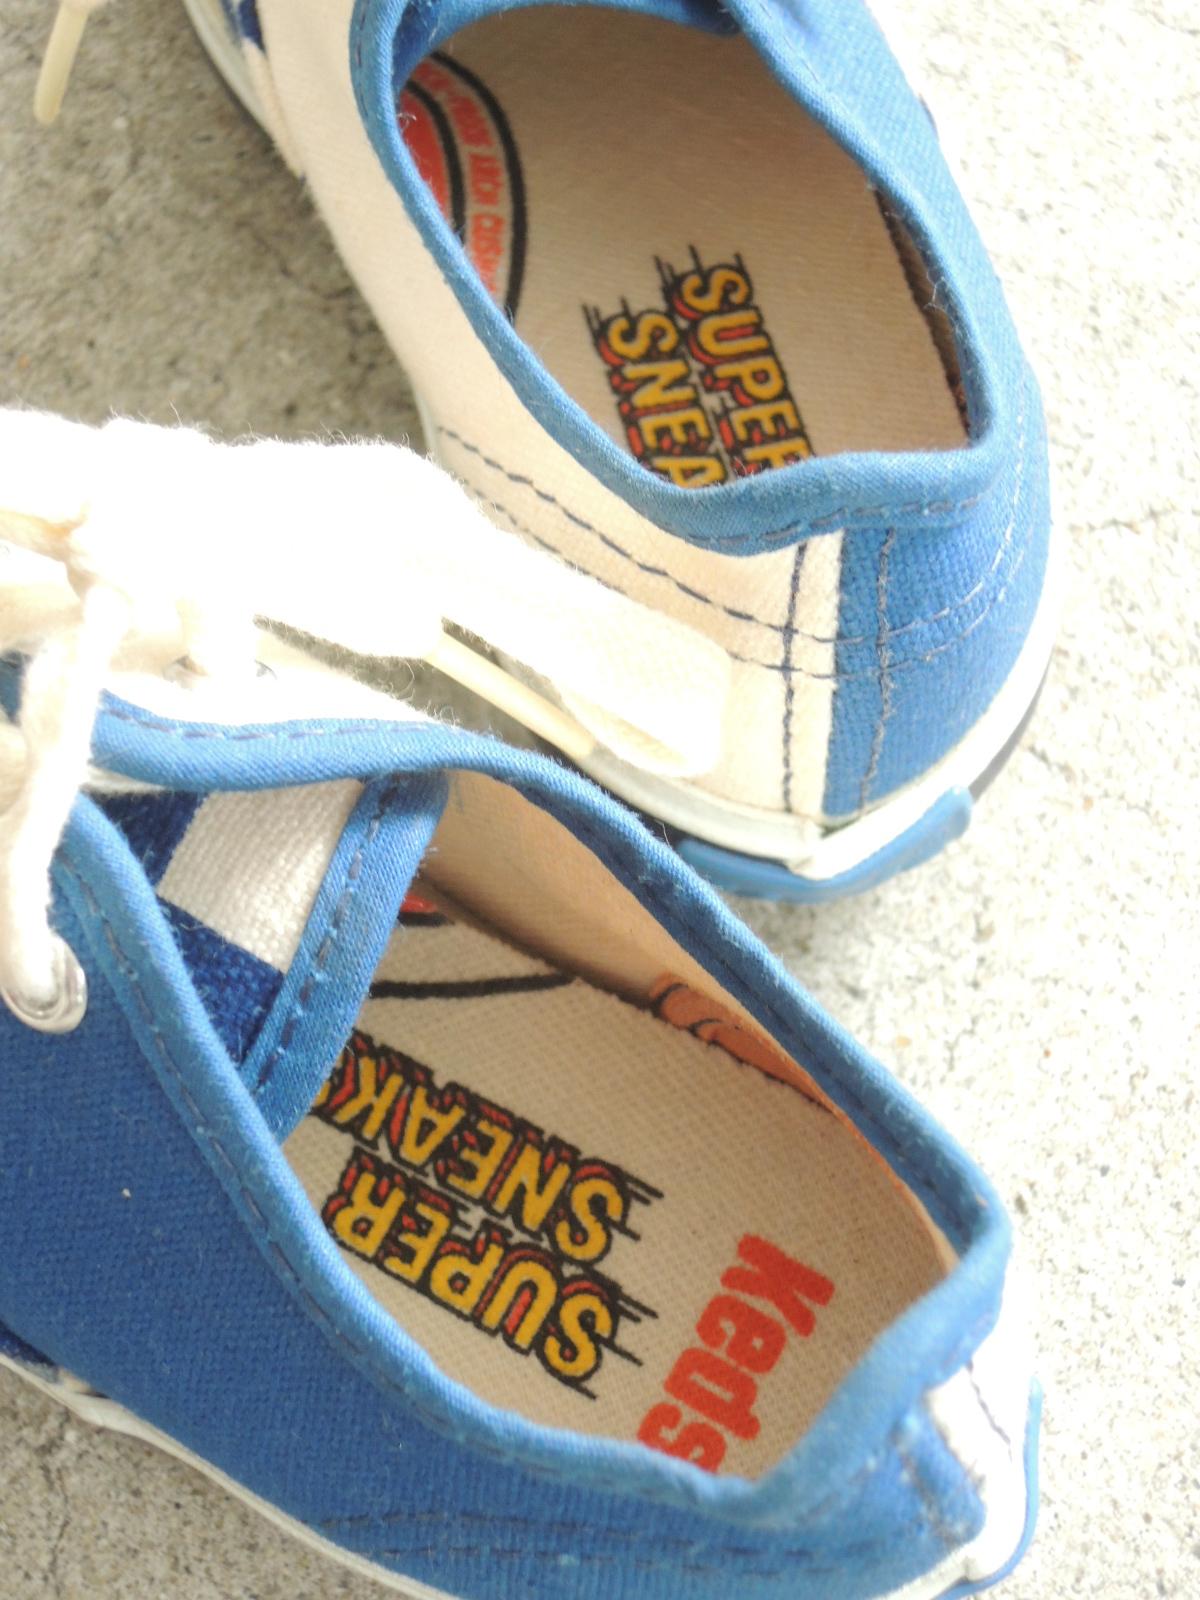 kedssupersneaker02.JPG